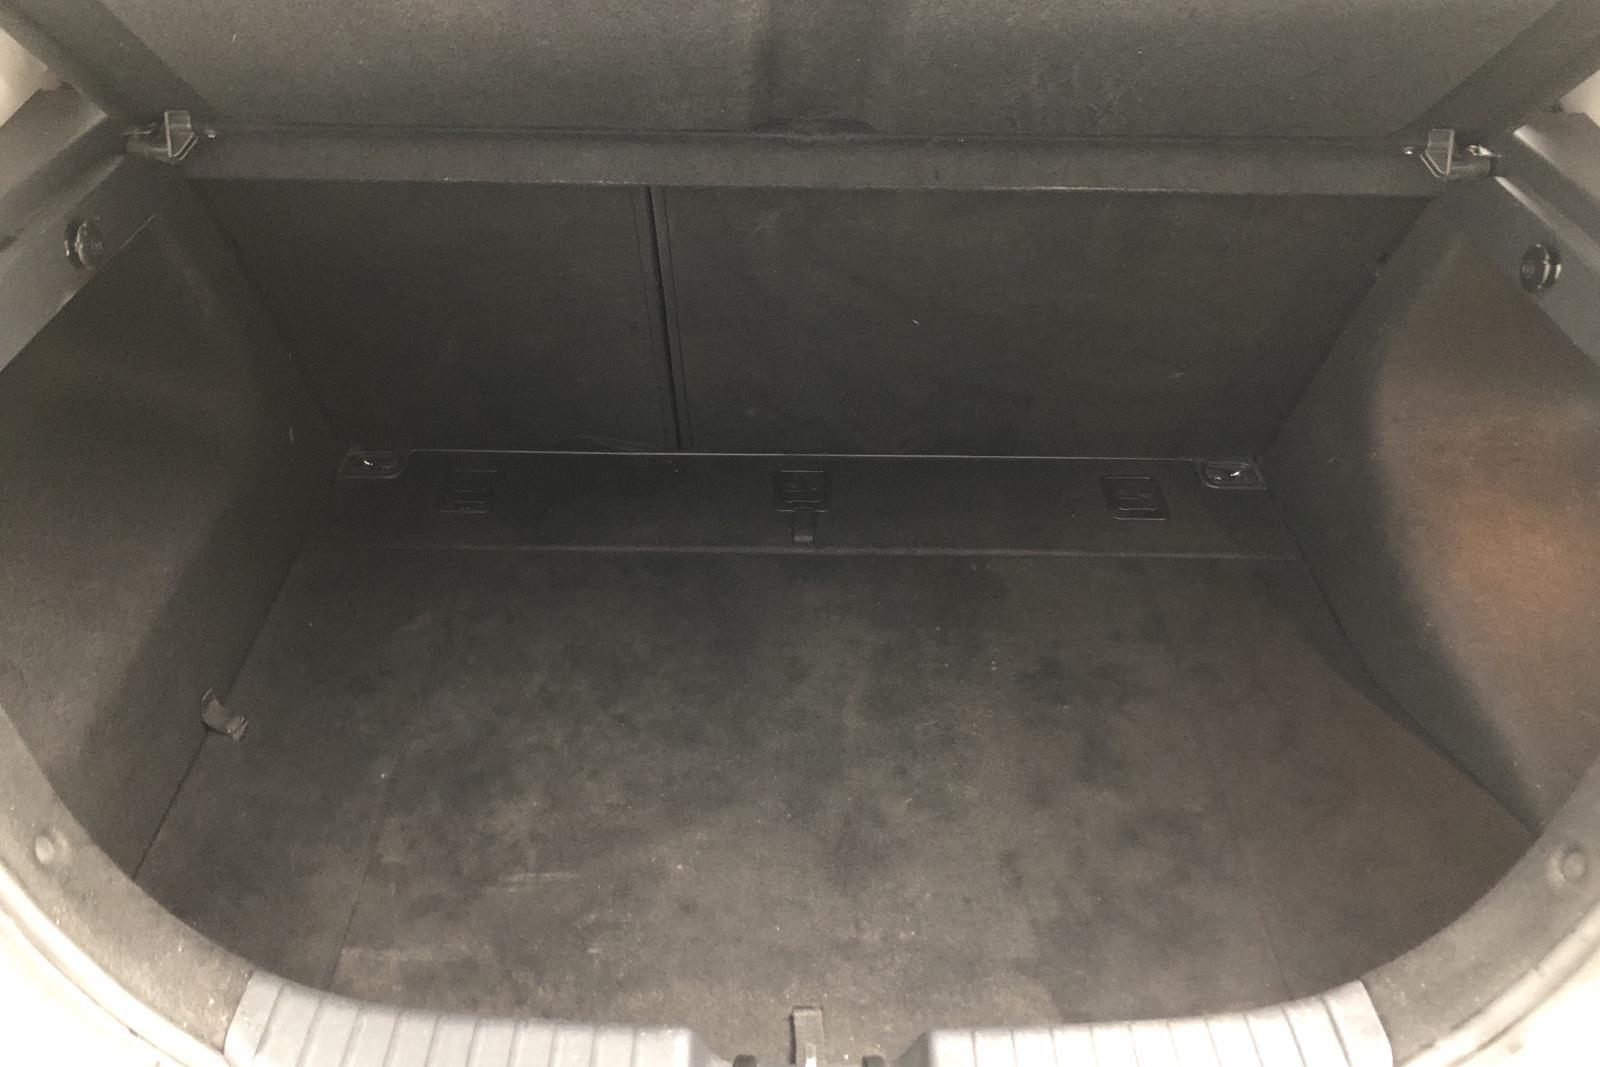 Hyundai i30 1.6 CRDi 5dr (90hk) - 77 240 km - Manual - white - 2008